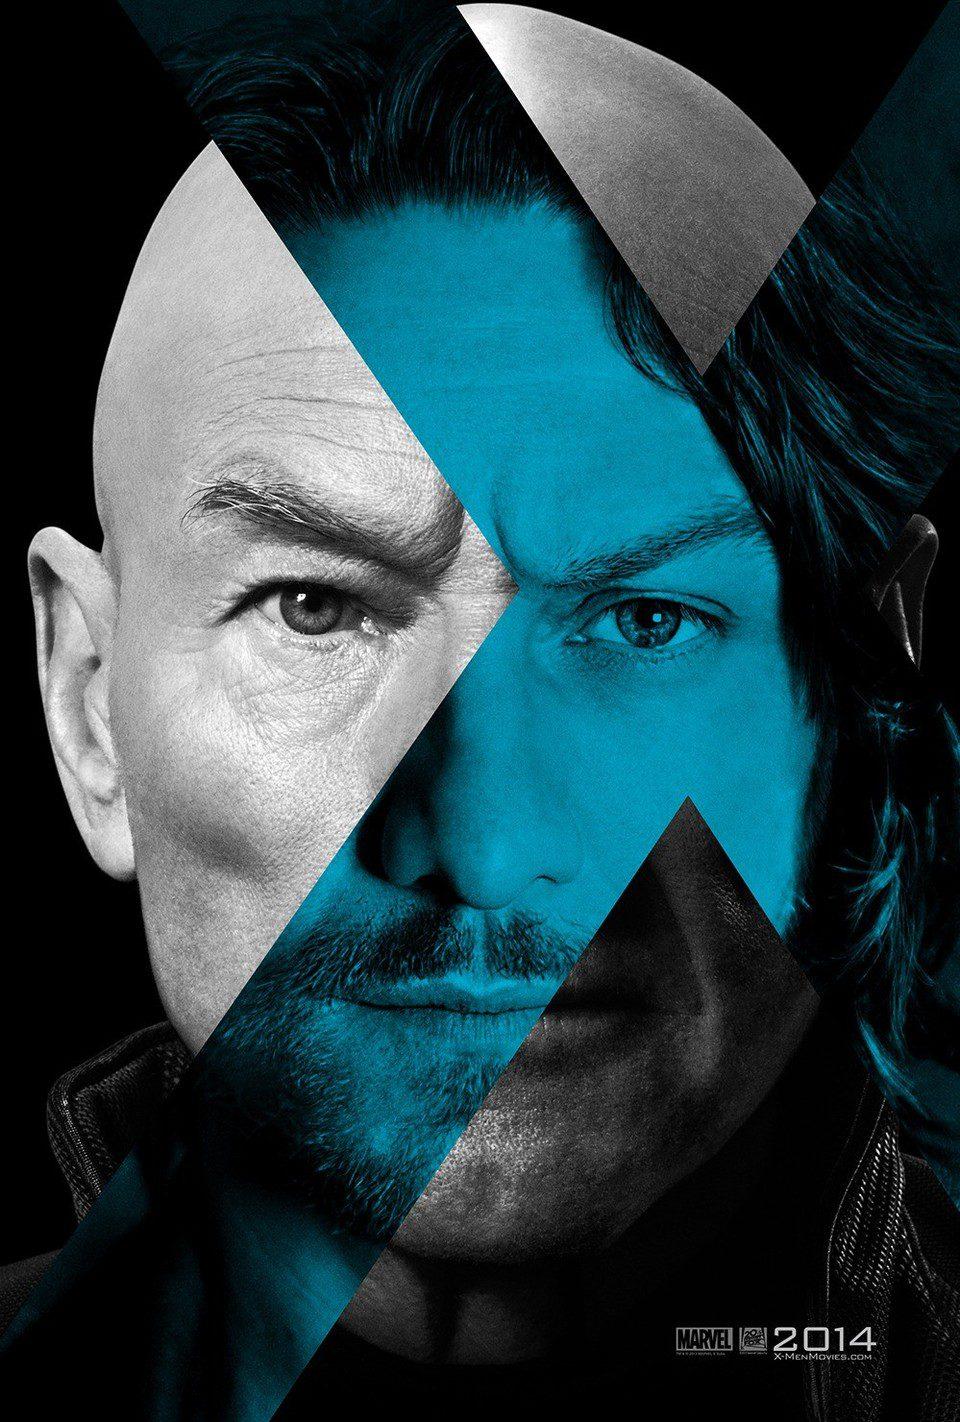 Cartel Profesor X de 'X-Men: Dias del futuro pasado'